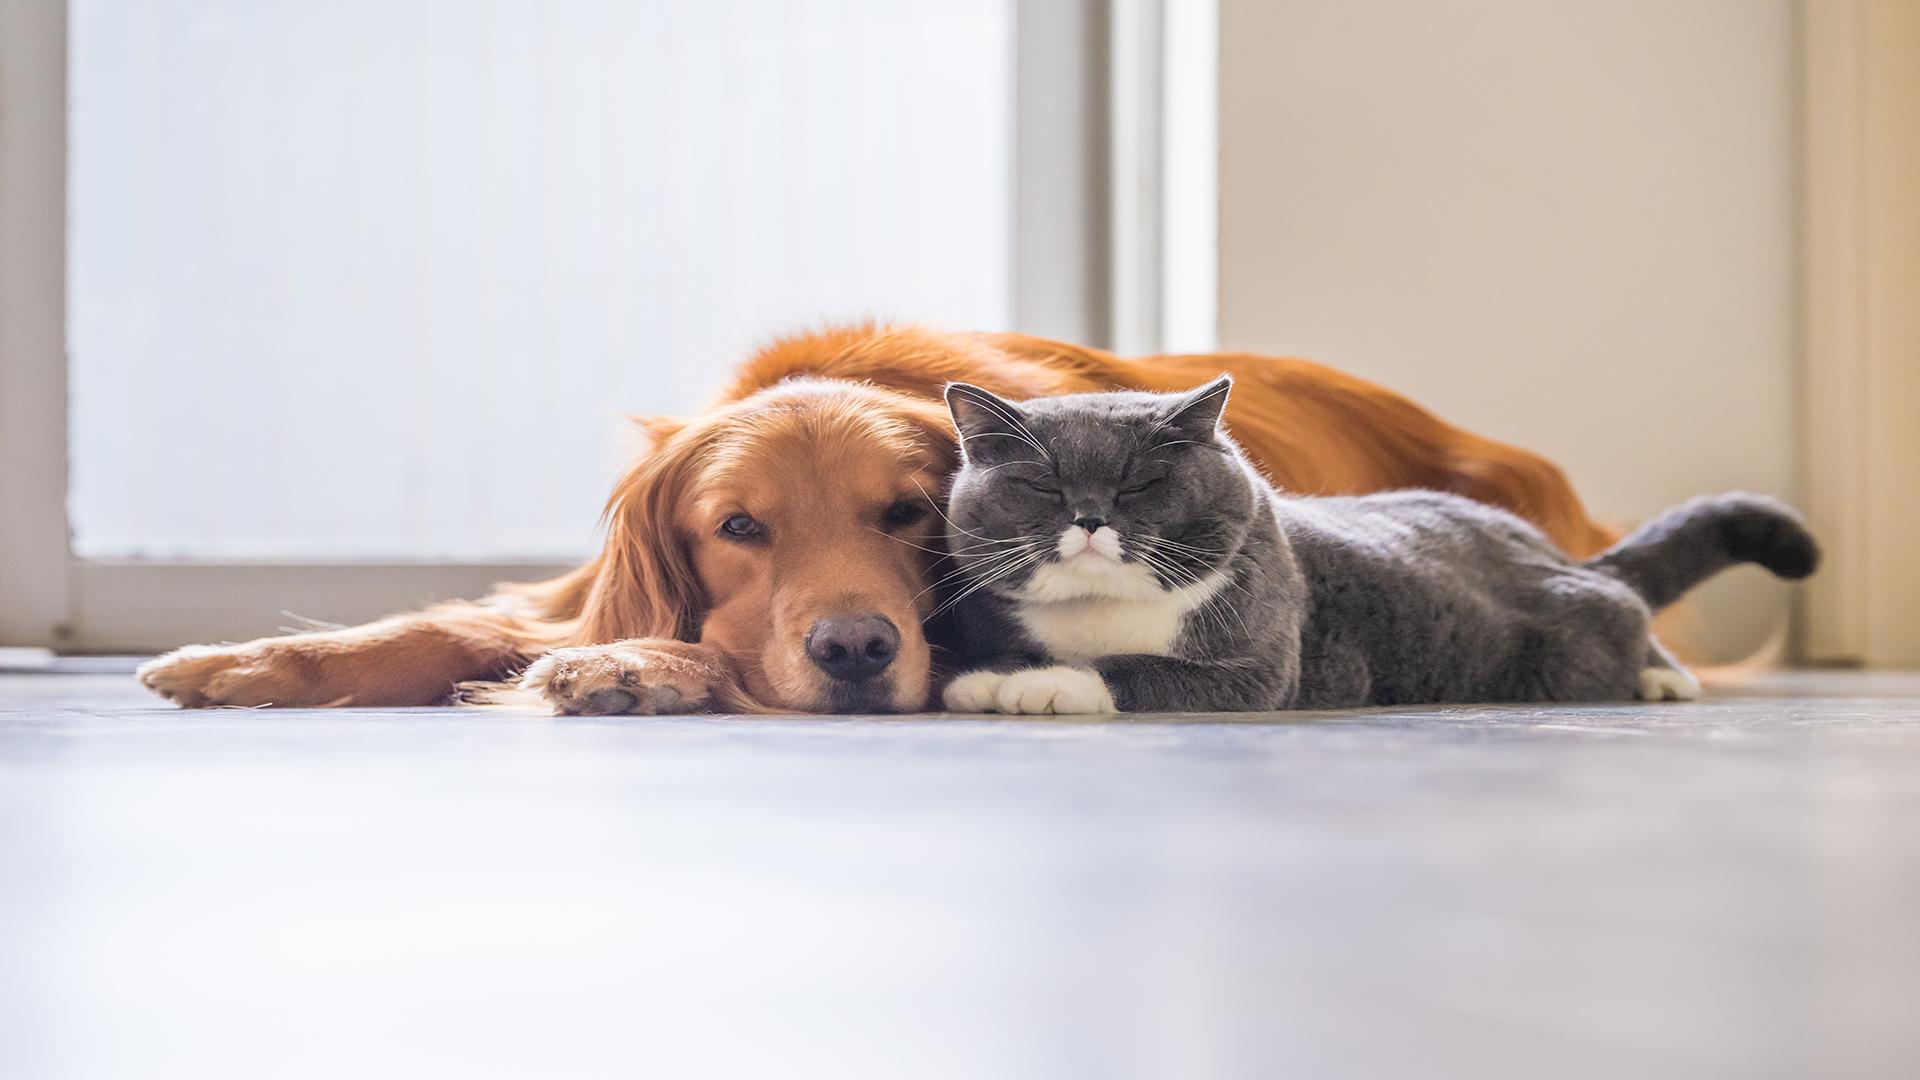 generic dog and cat